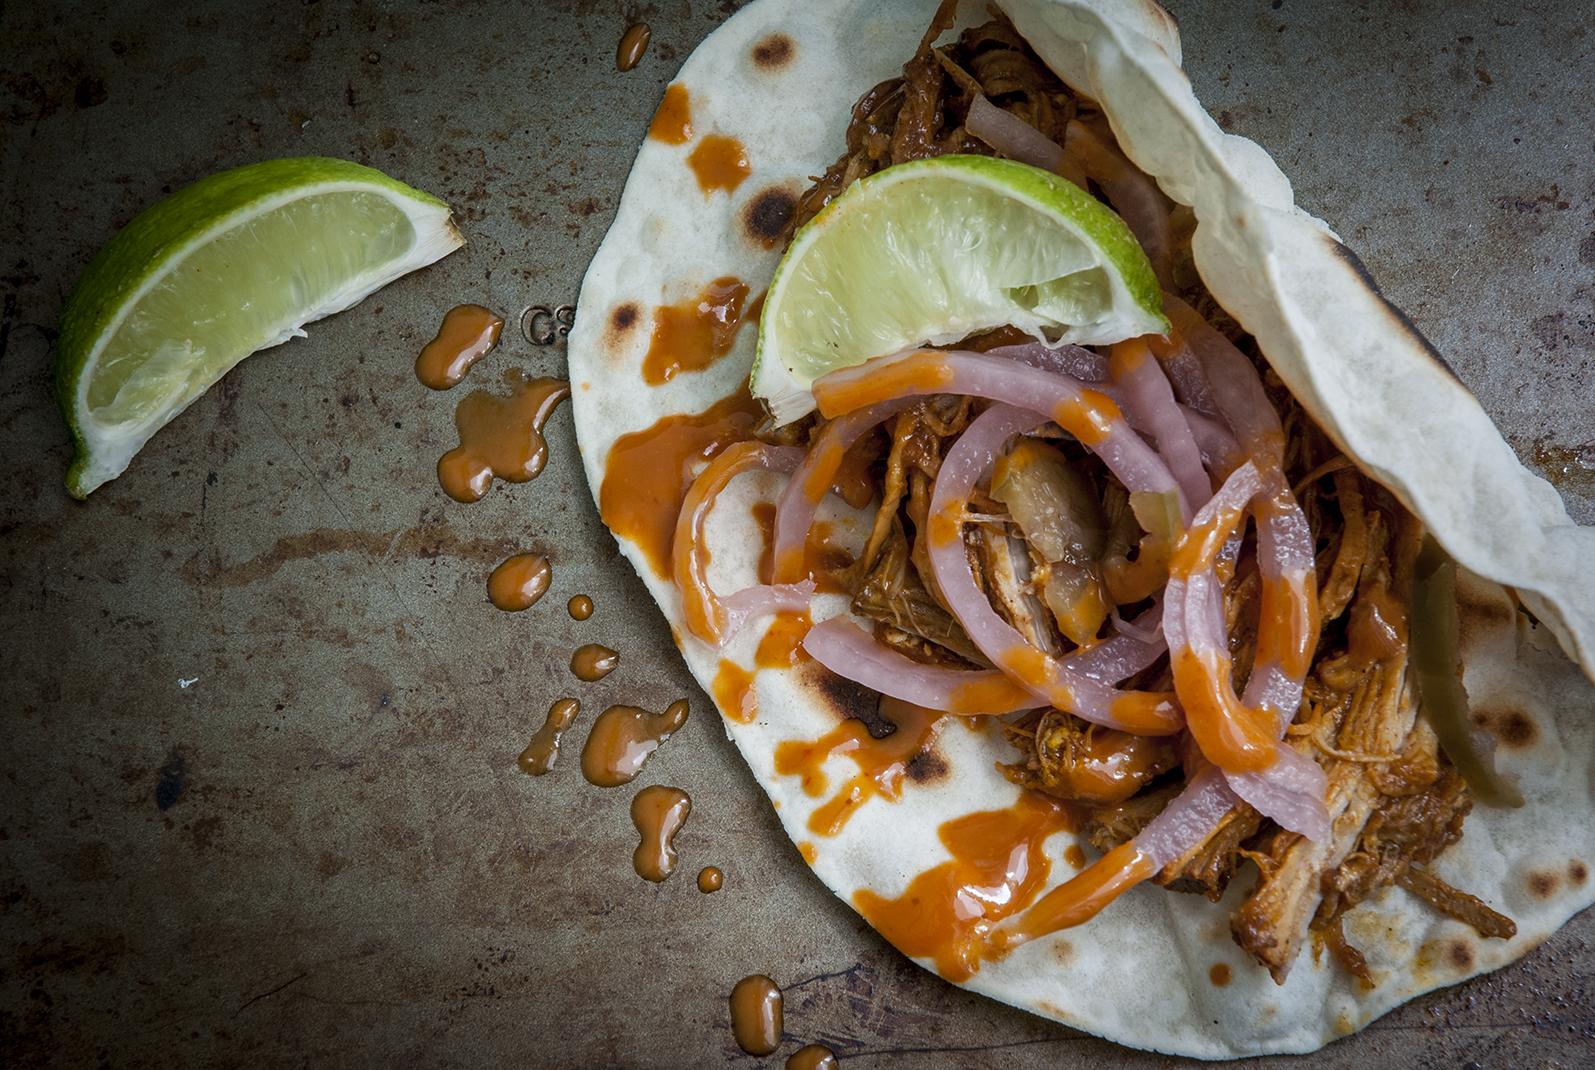 conchinita pibil tacos